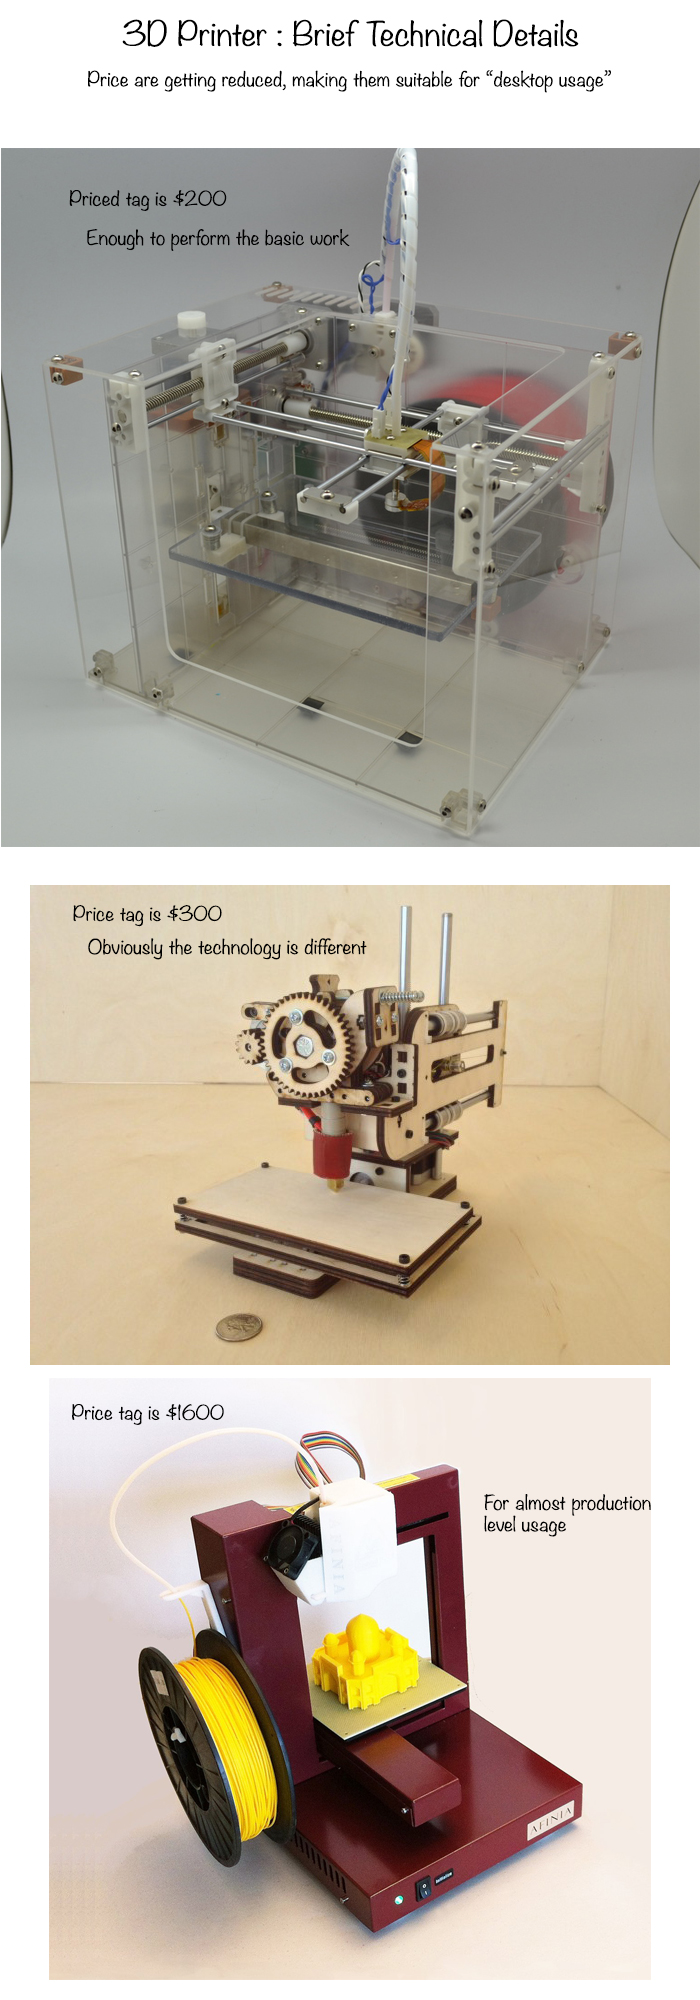 3D-Printer-Brief-Technical-Details